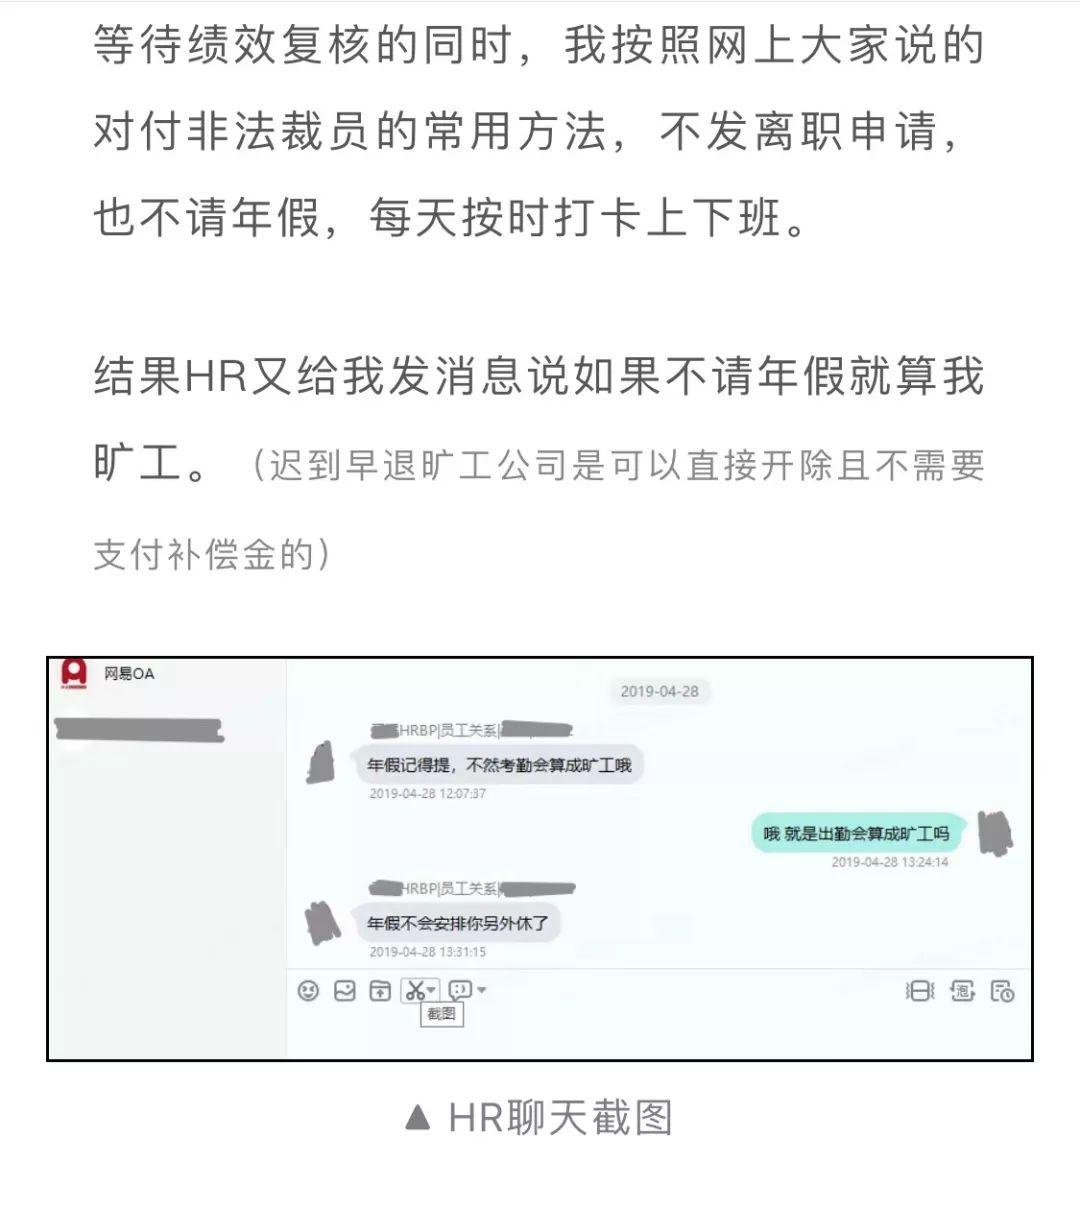 「sinanba直播」韩国会通过8项治霾法案:强制教室配备空气净化器